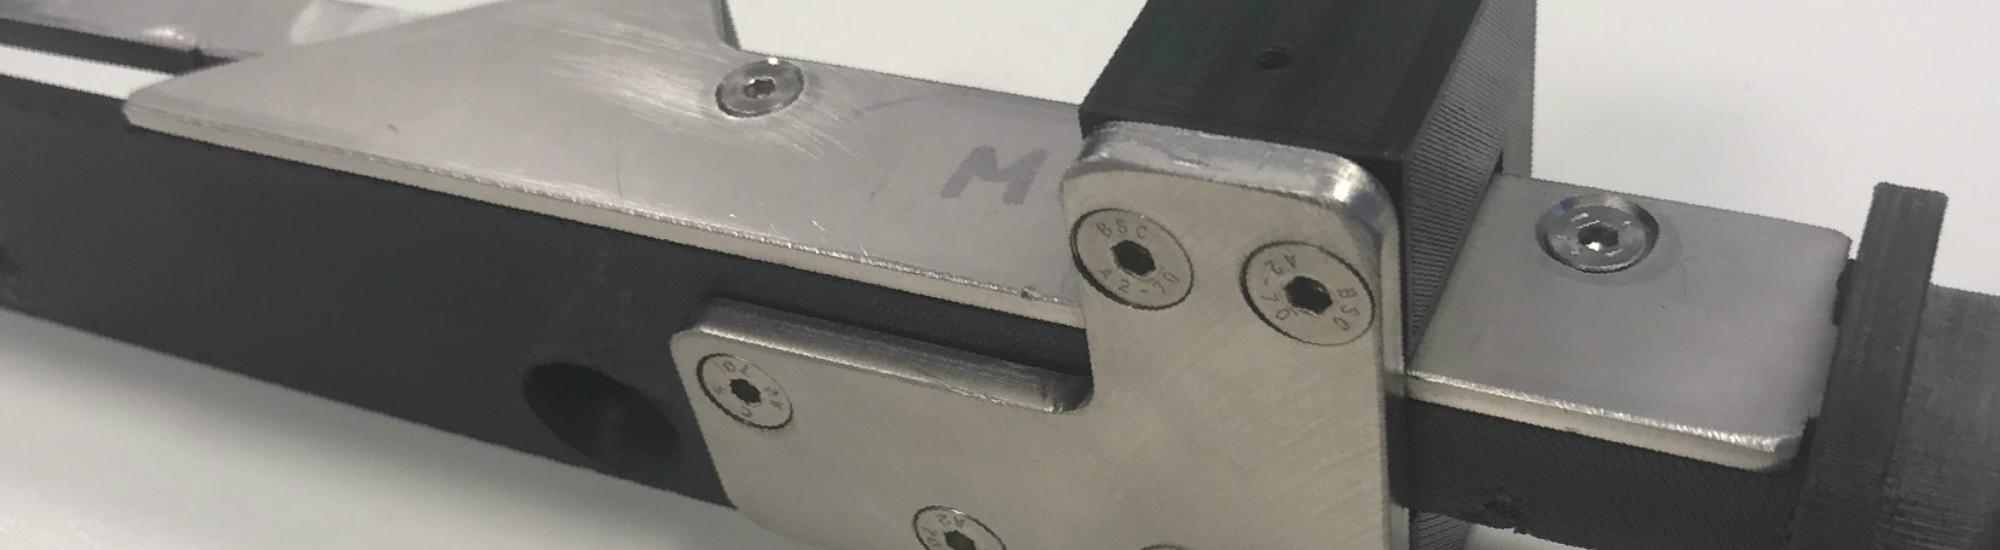 Formando 3D print tool